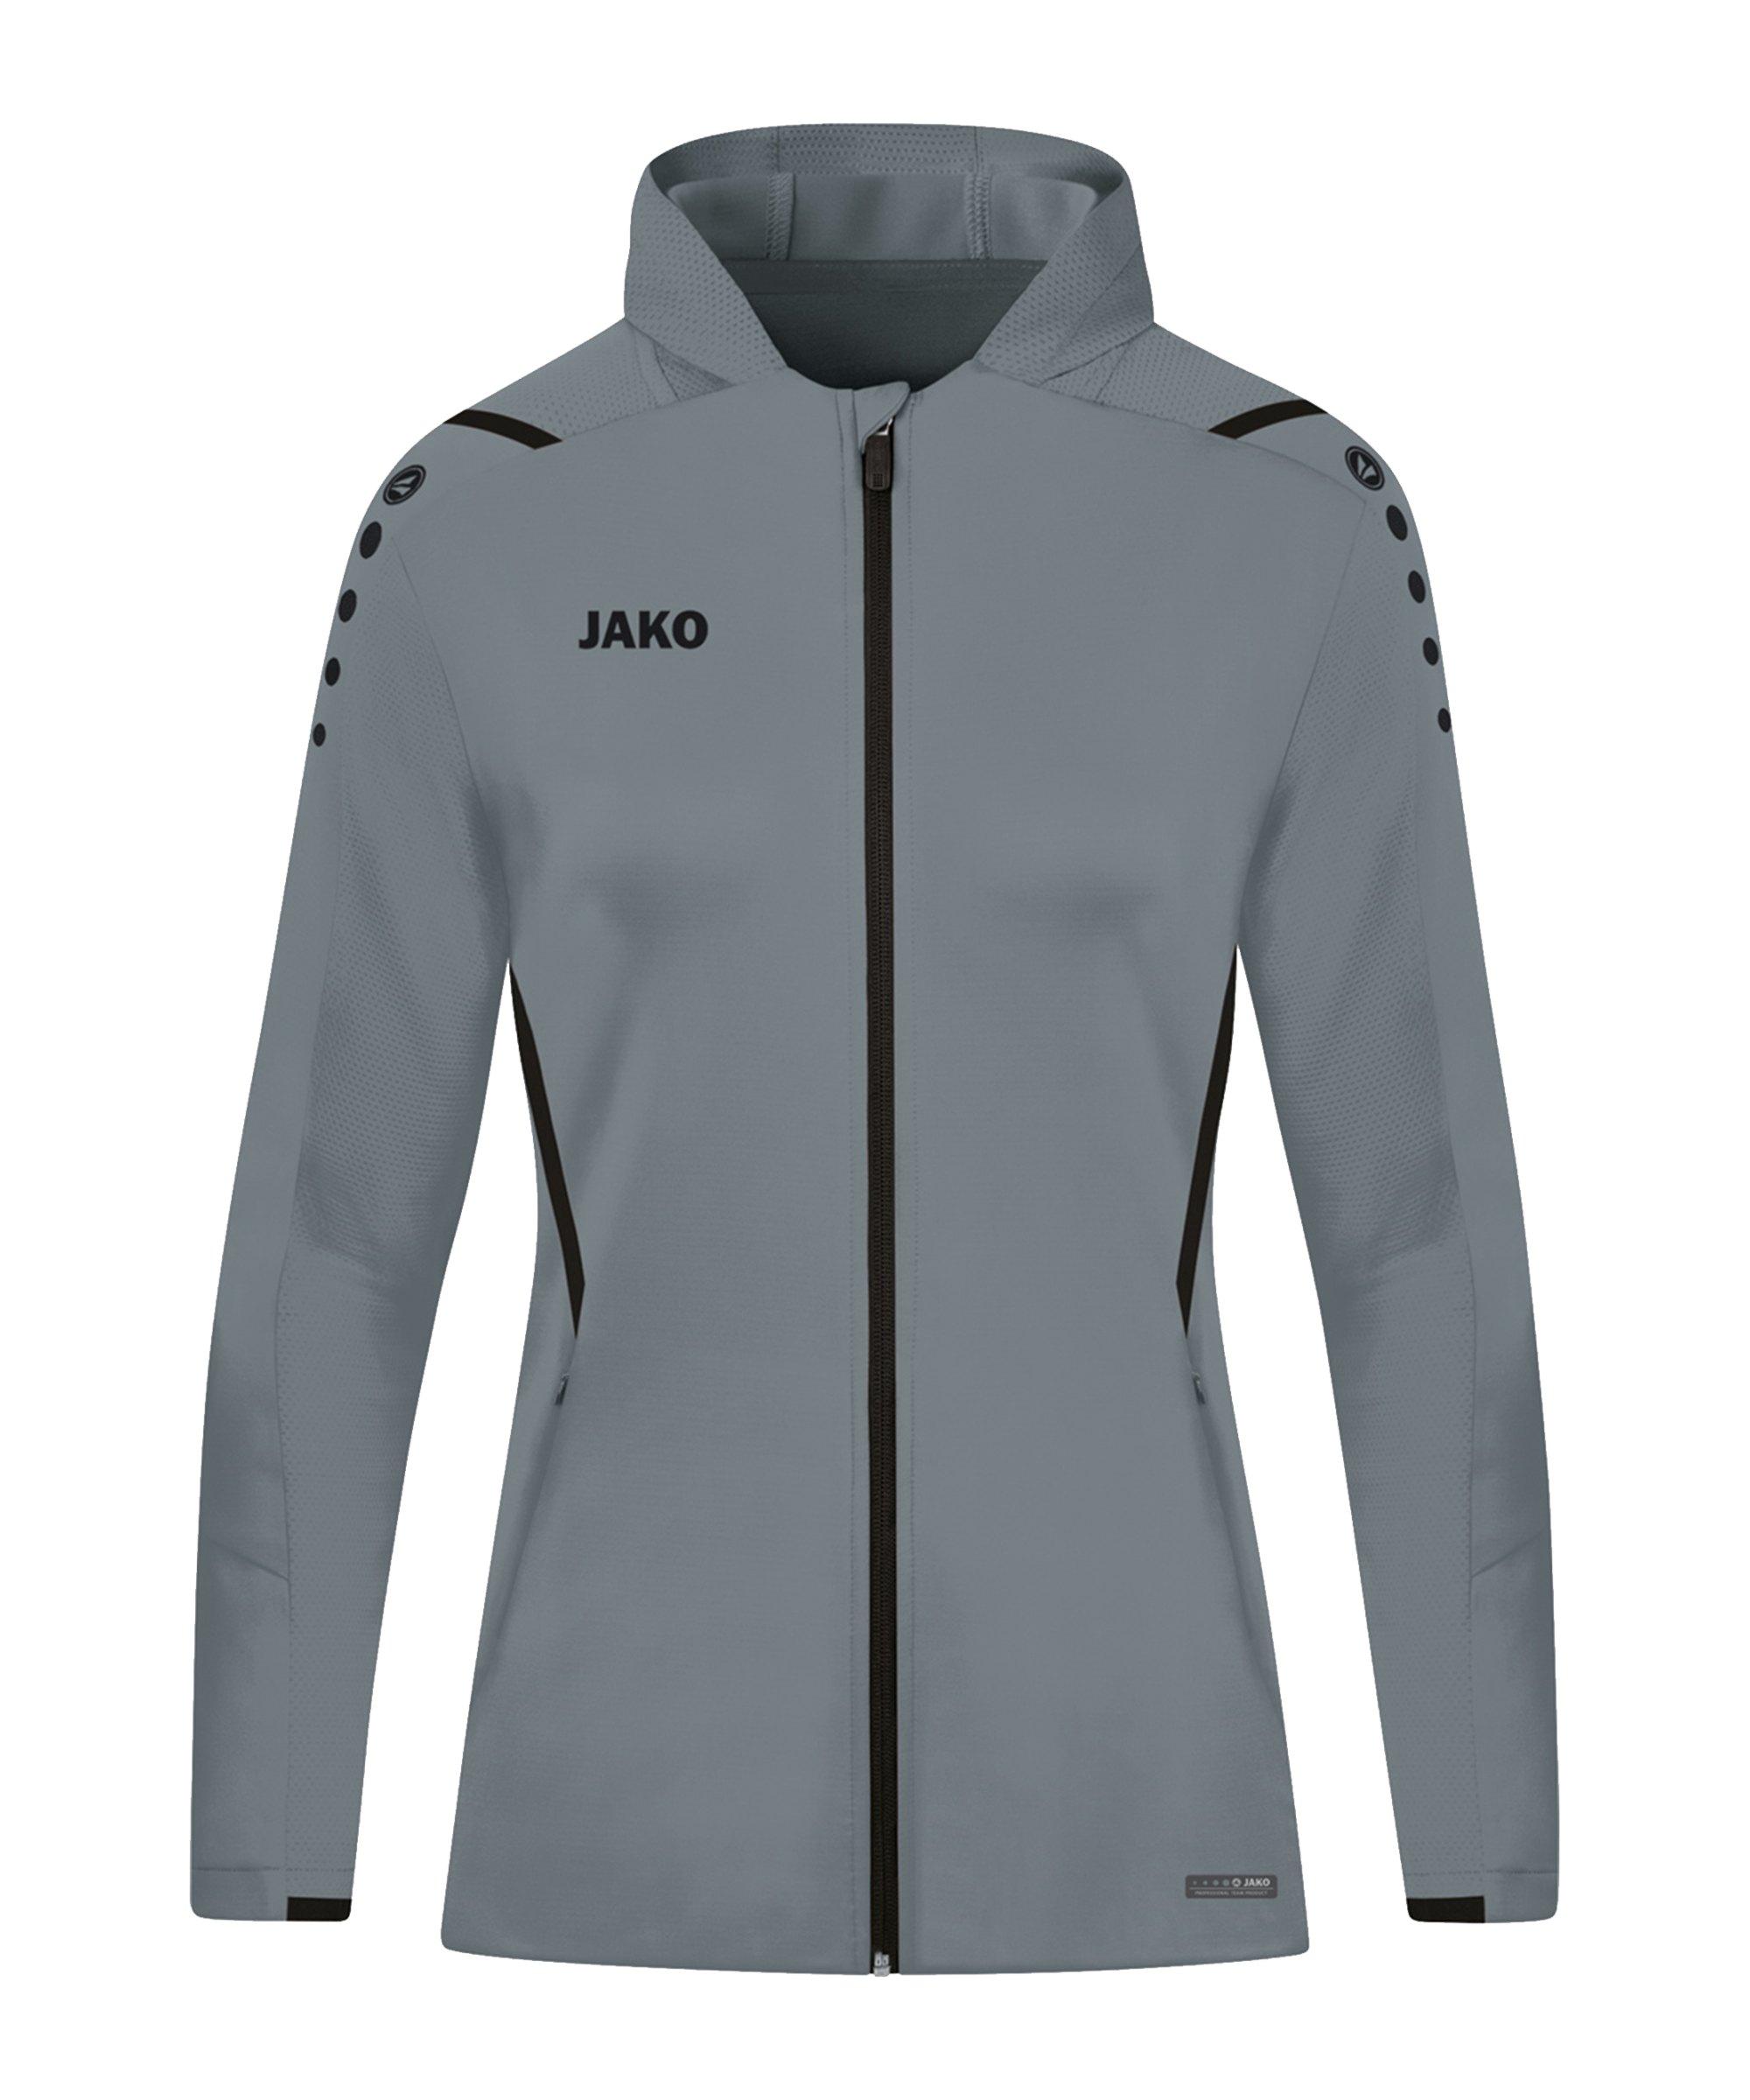 JAKO Challenge Trainingsjacke Damen Grau F841 - grau